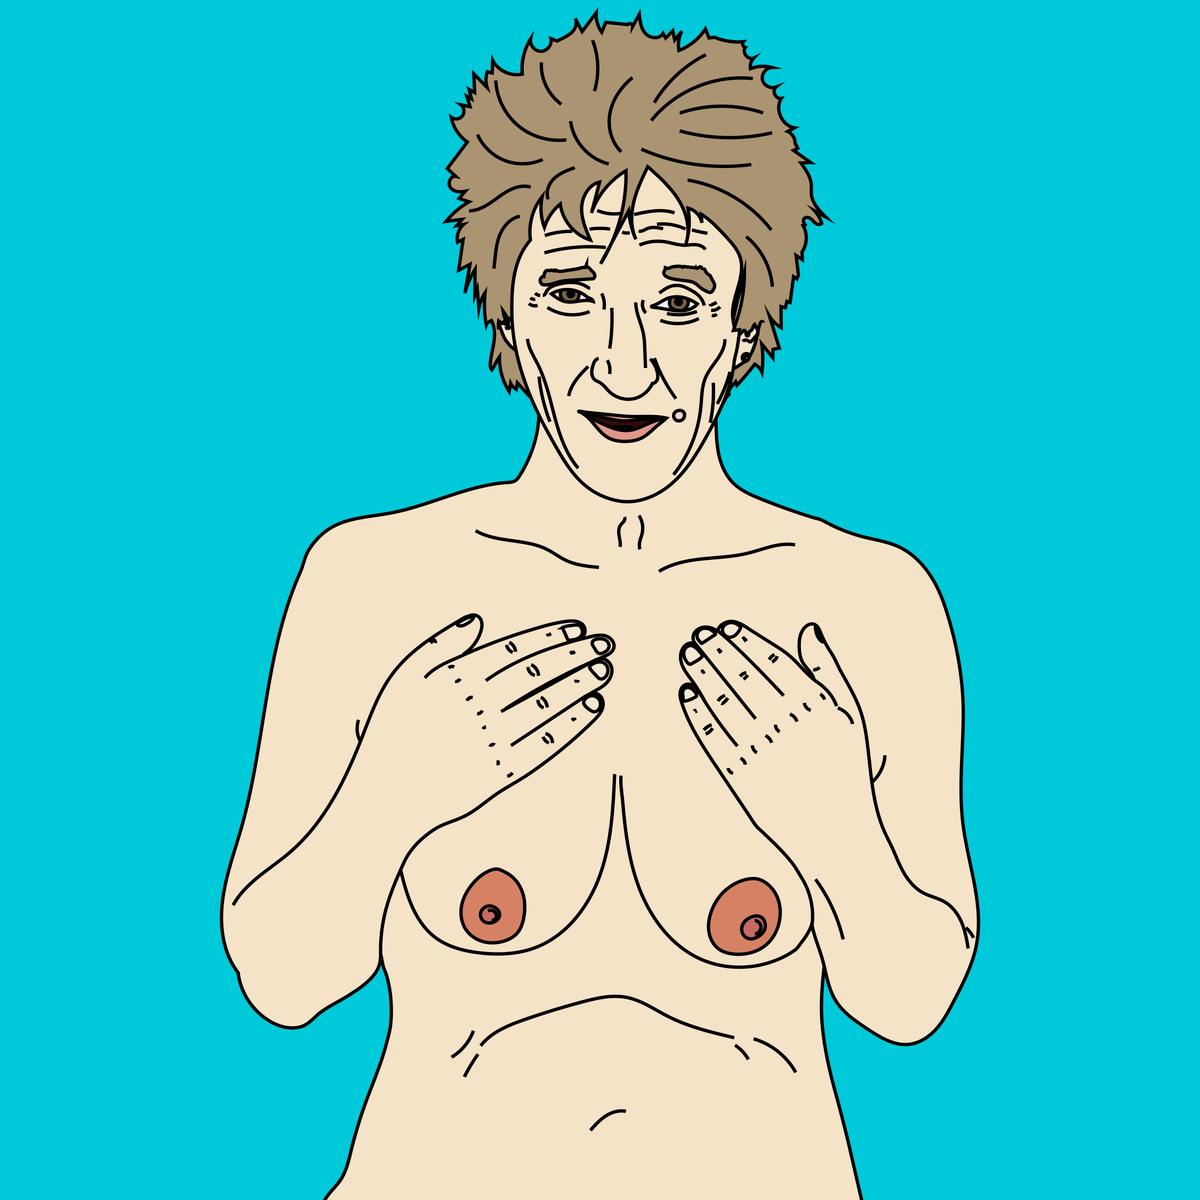 Rod Stewart with Tits. cc: @rodstewart #celebritieswithtits